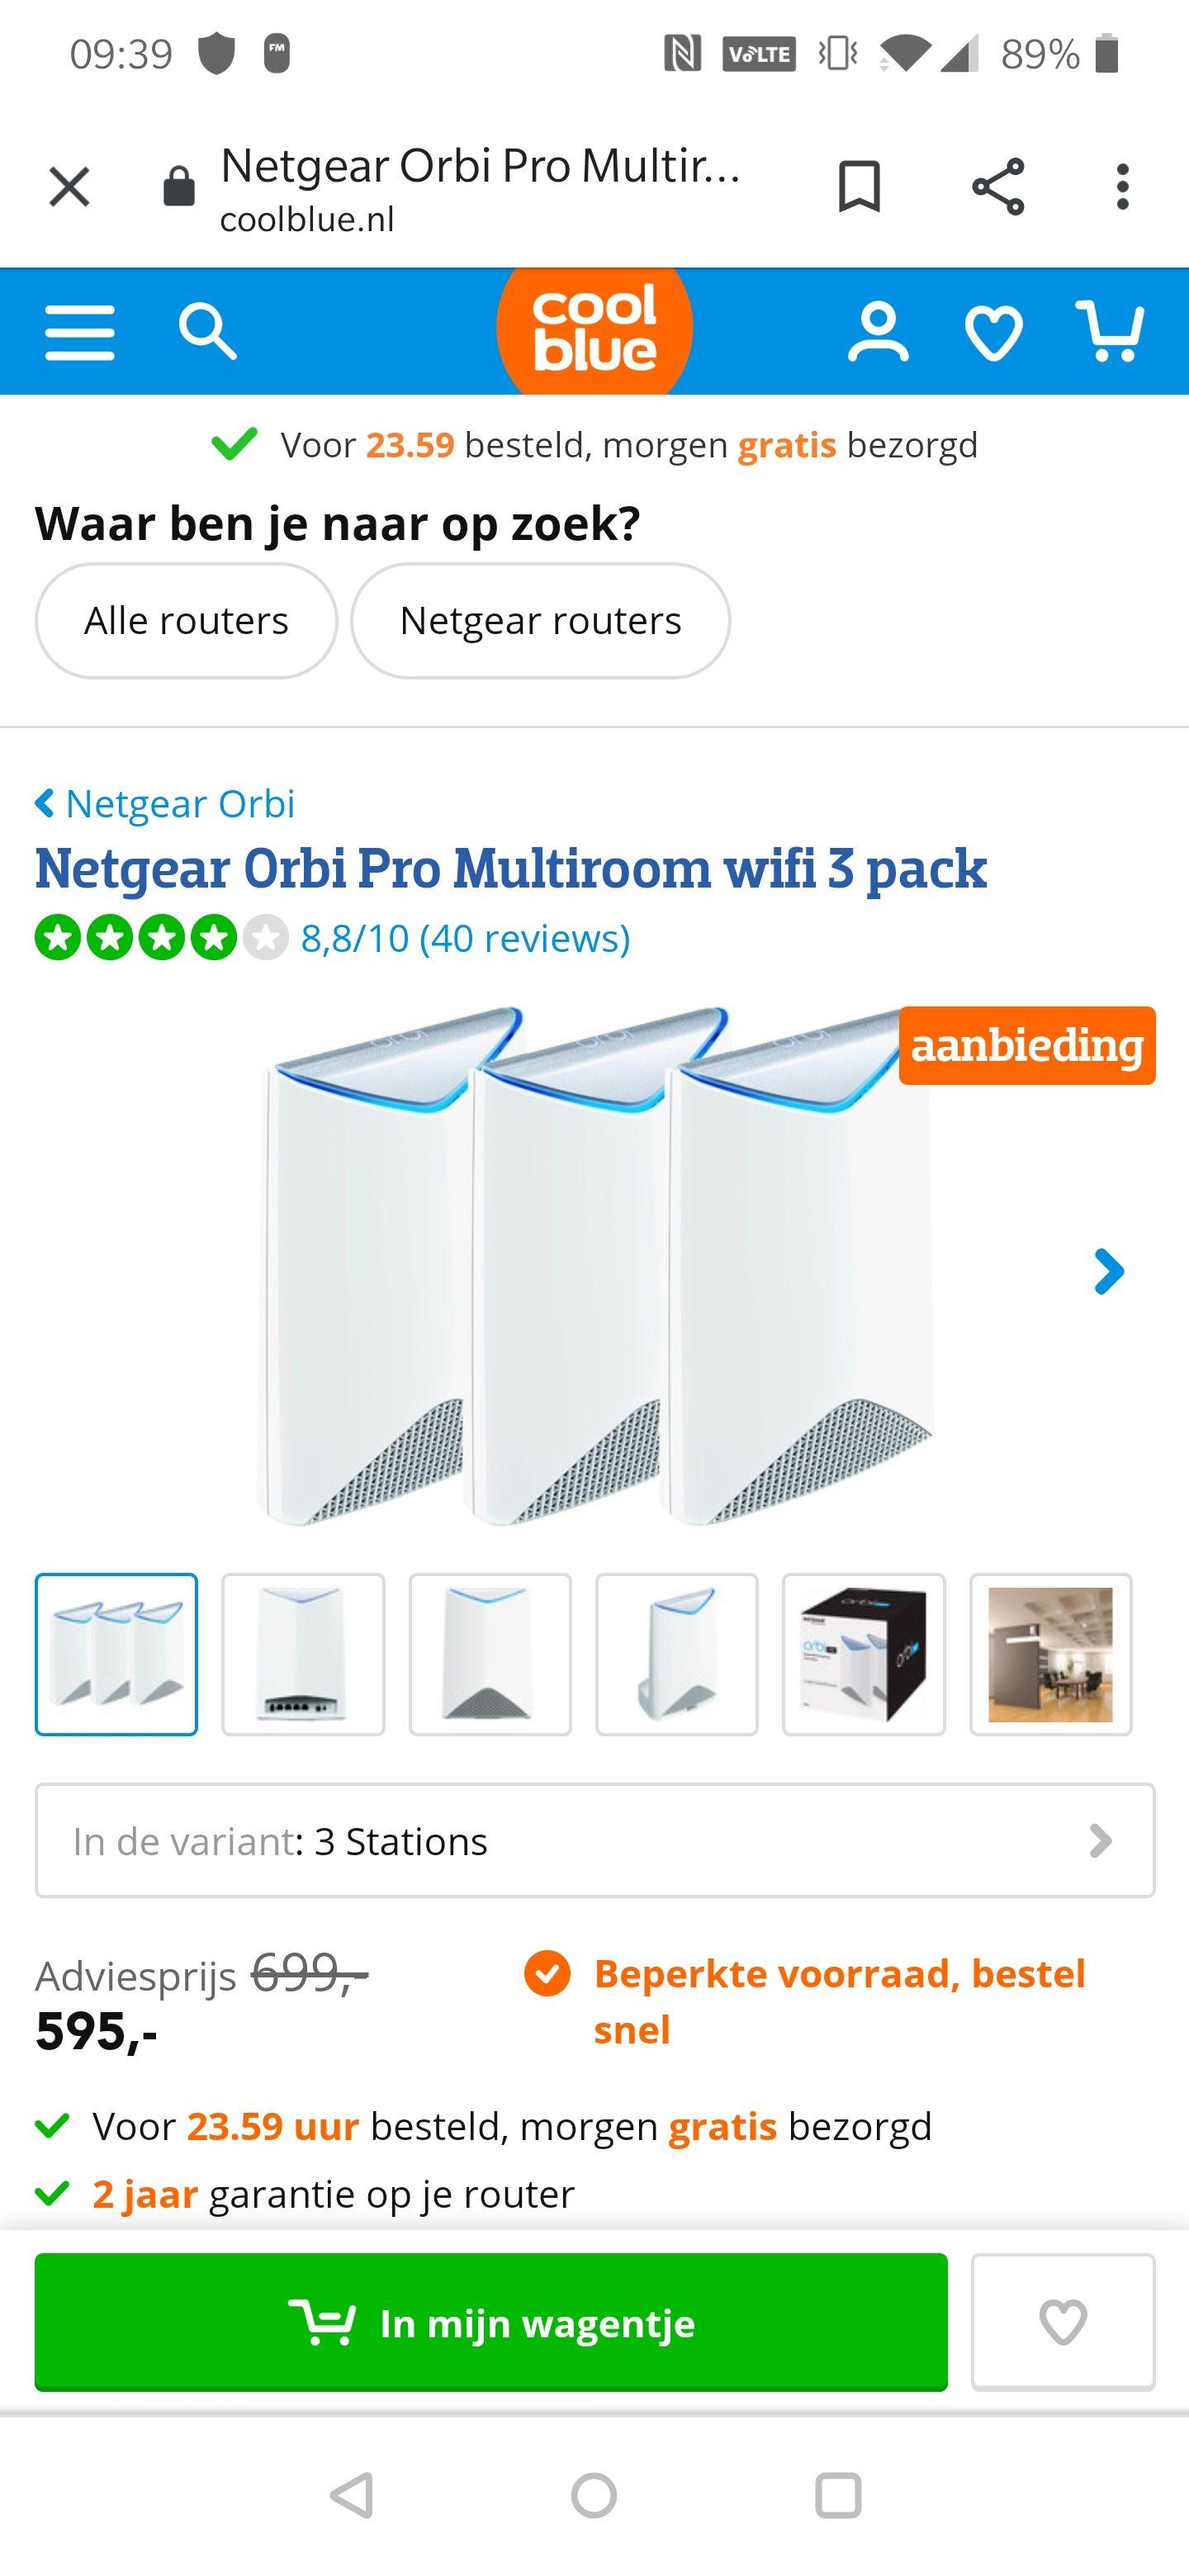 Netgear Orbi Pro Multiroom wifi 3 pack